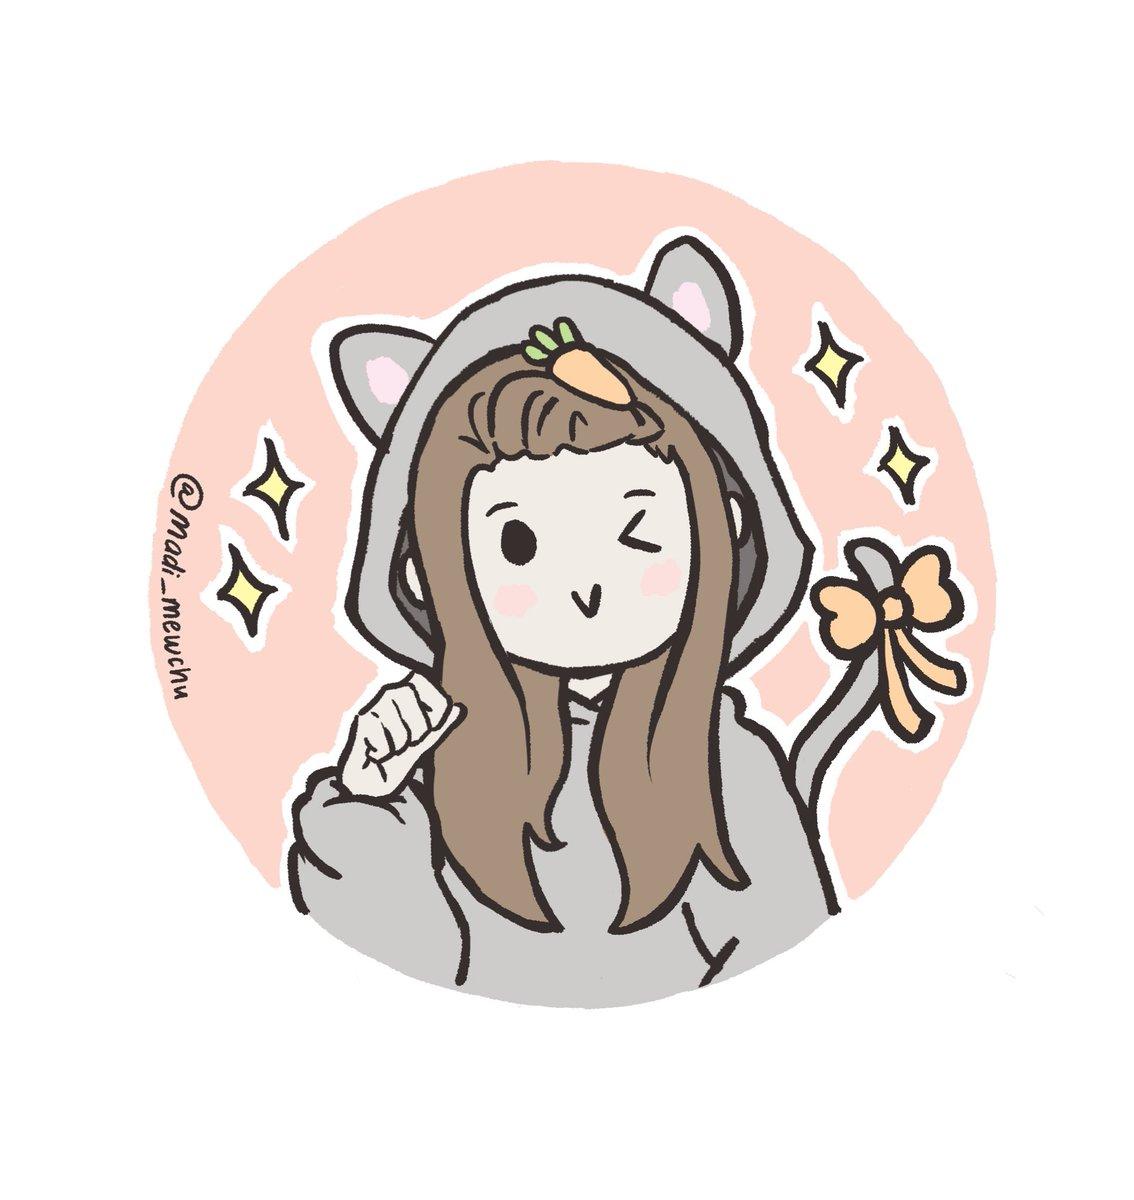 Just @TeanaKitten in a kitten onesie! ✨ sheesh it's just too cute with the carrot hair clip! #tinakitten #fanart #cute #drawing #illustration